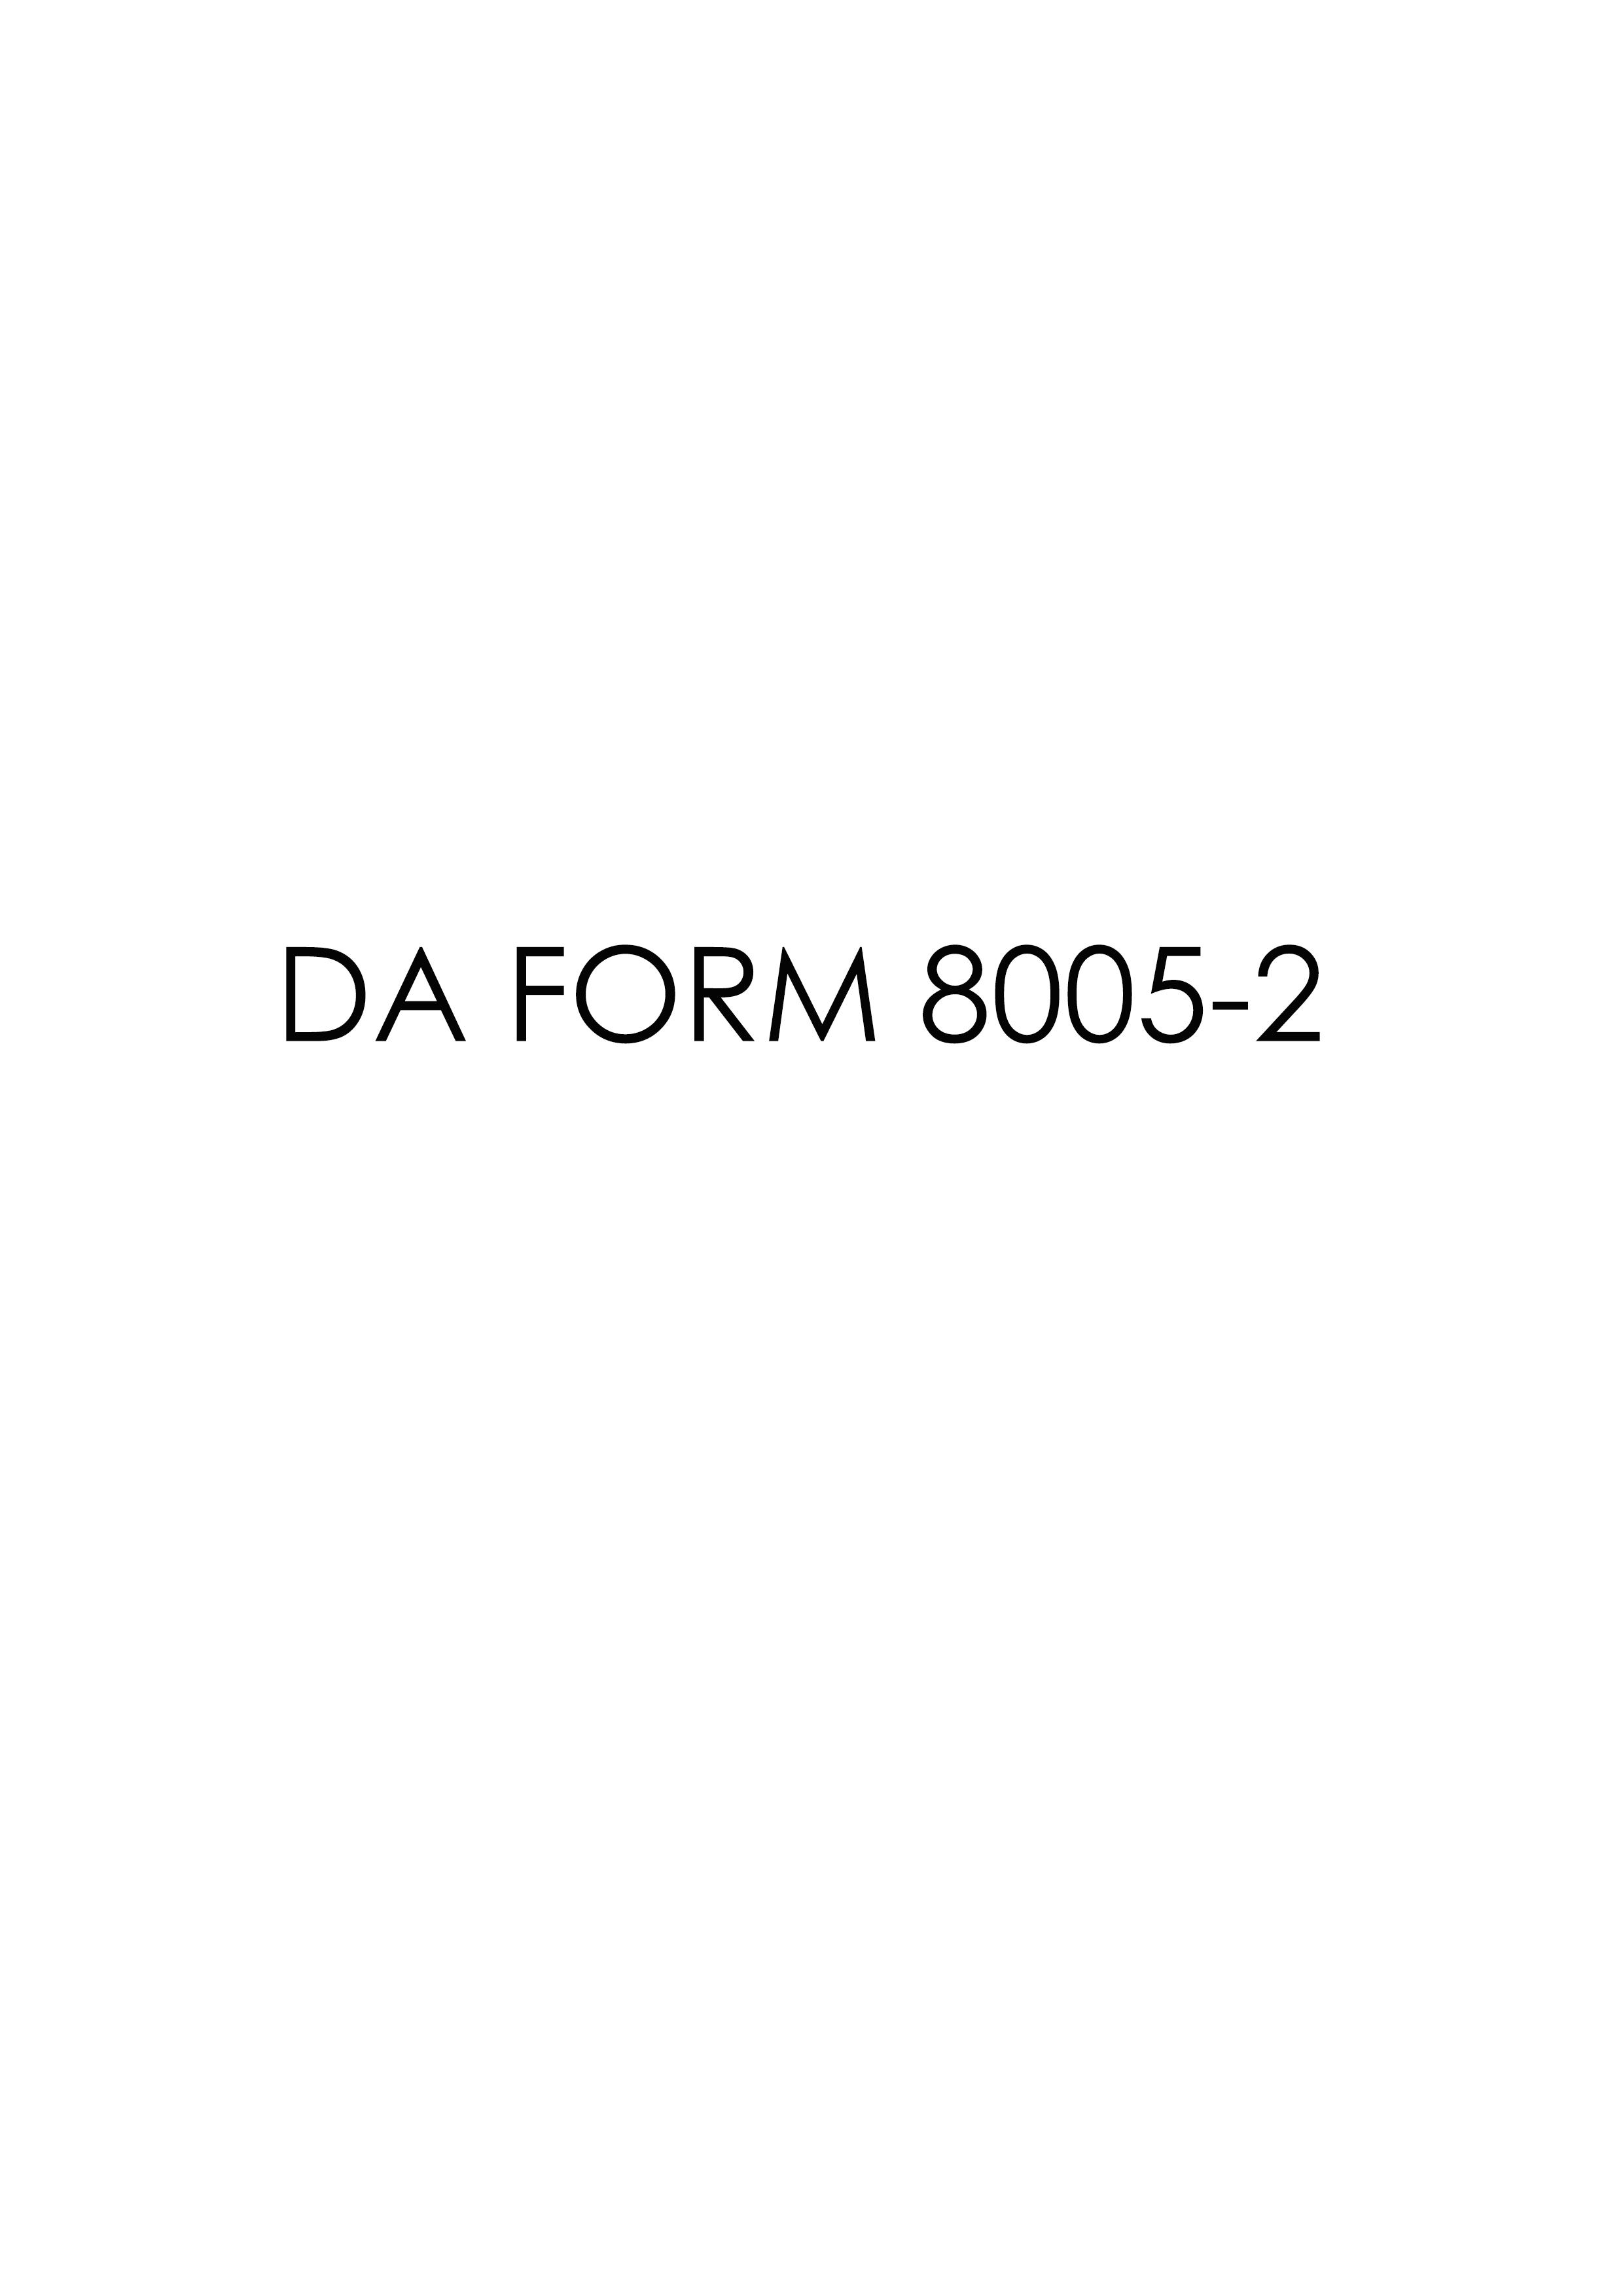 Download da Form 8005-2 Free